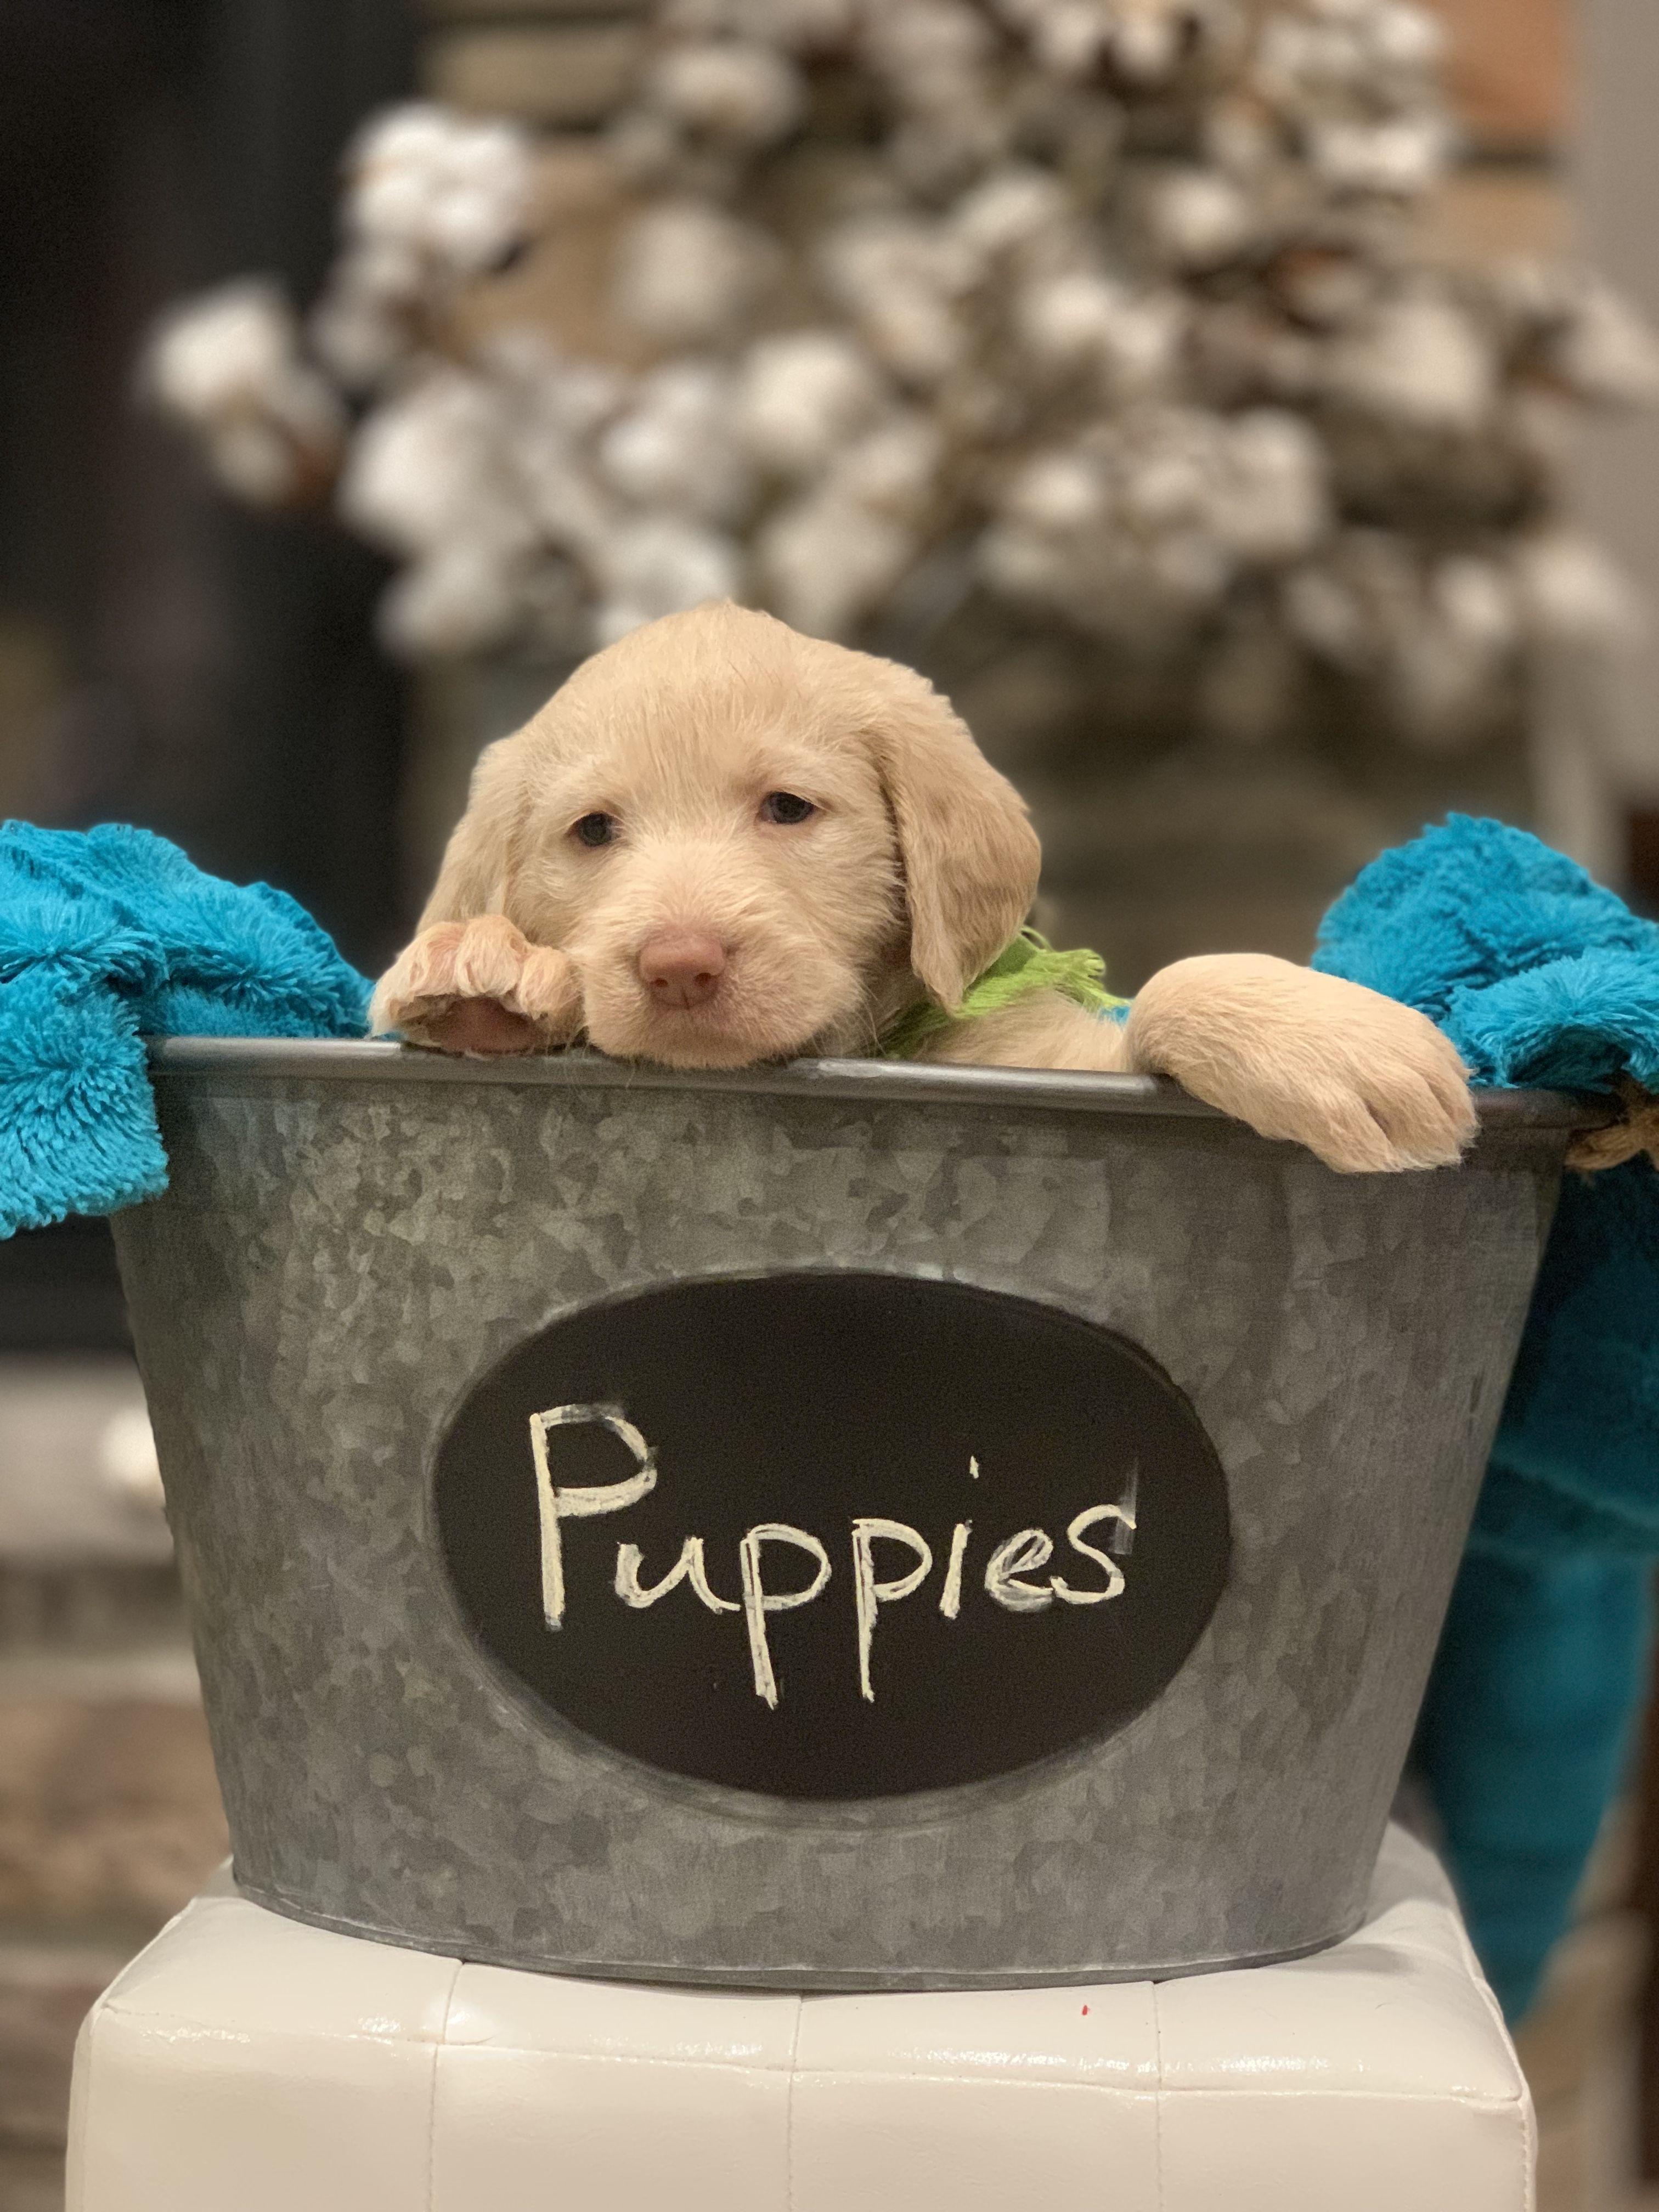 Pearla A Ckc Labradoodle Puppy For Sale From Visalia California